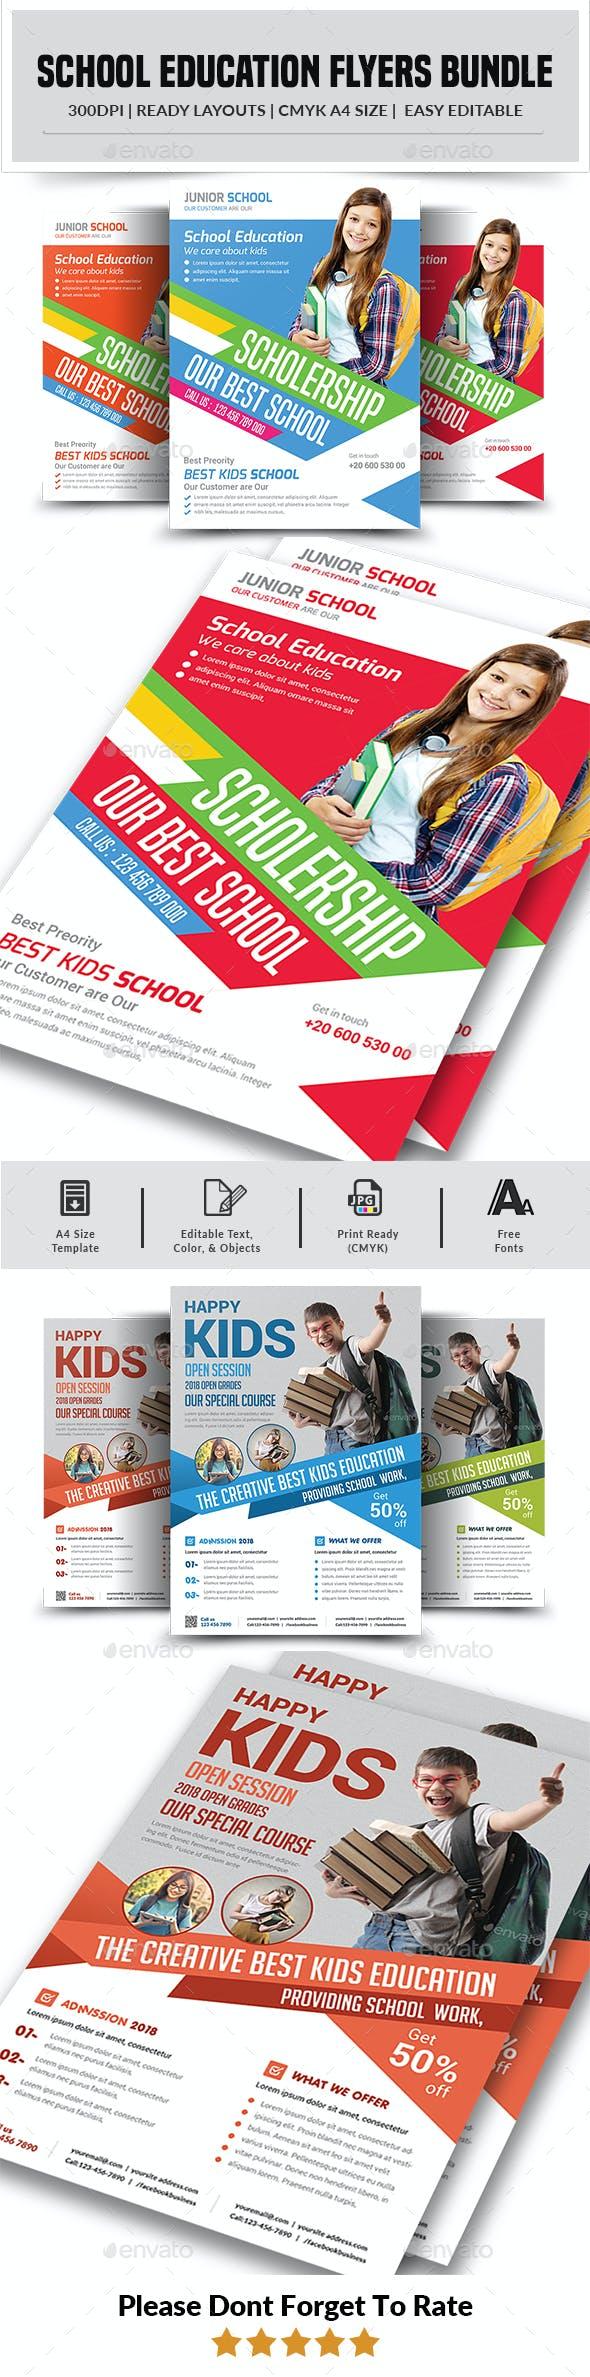 School Education Flyers Bundle